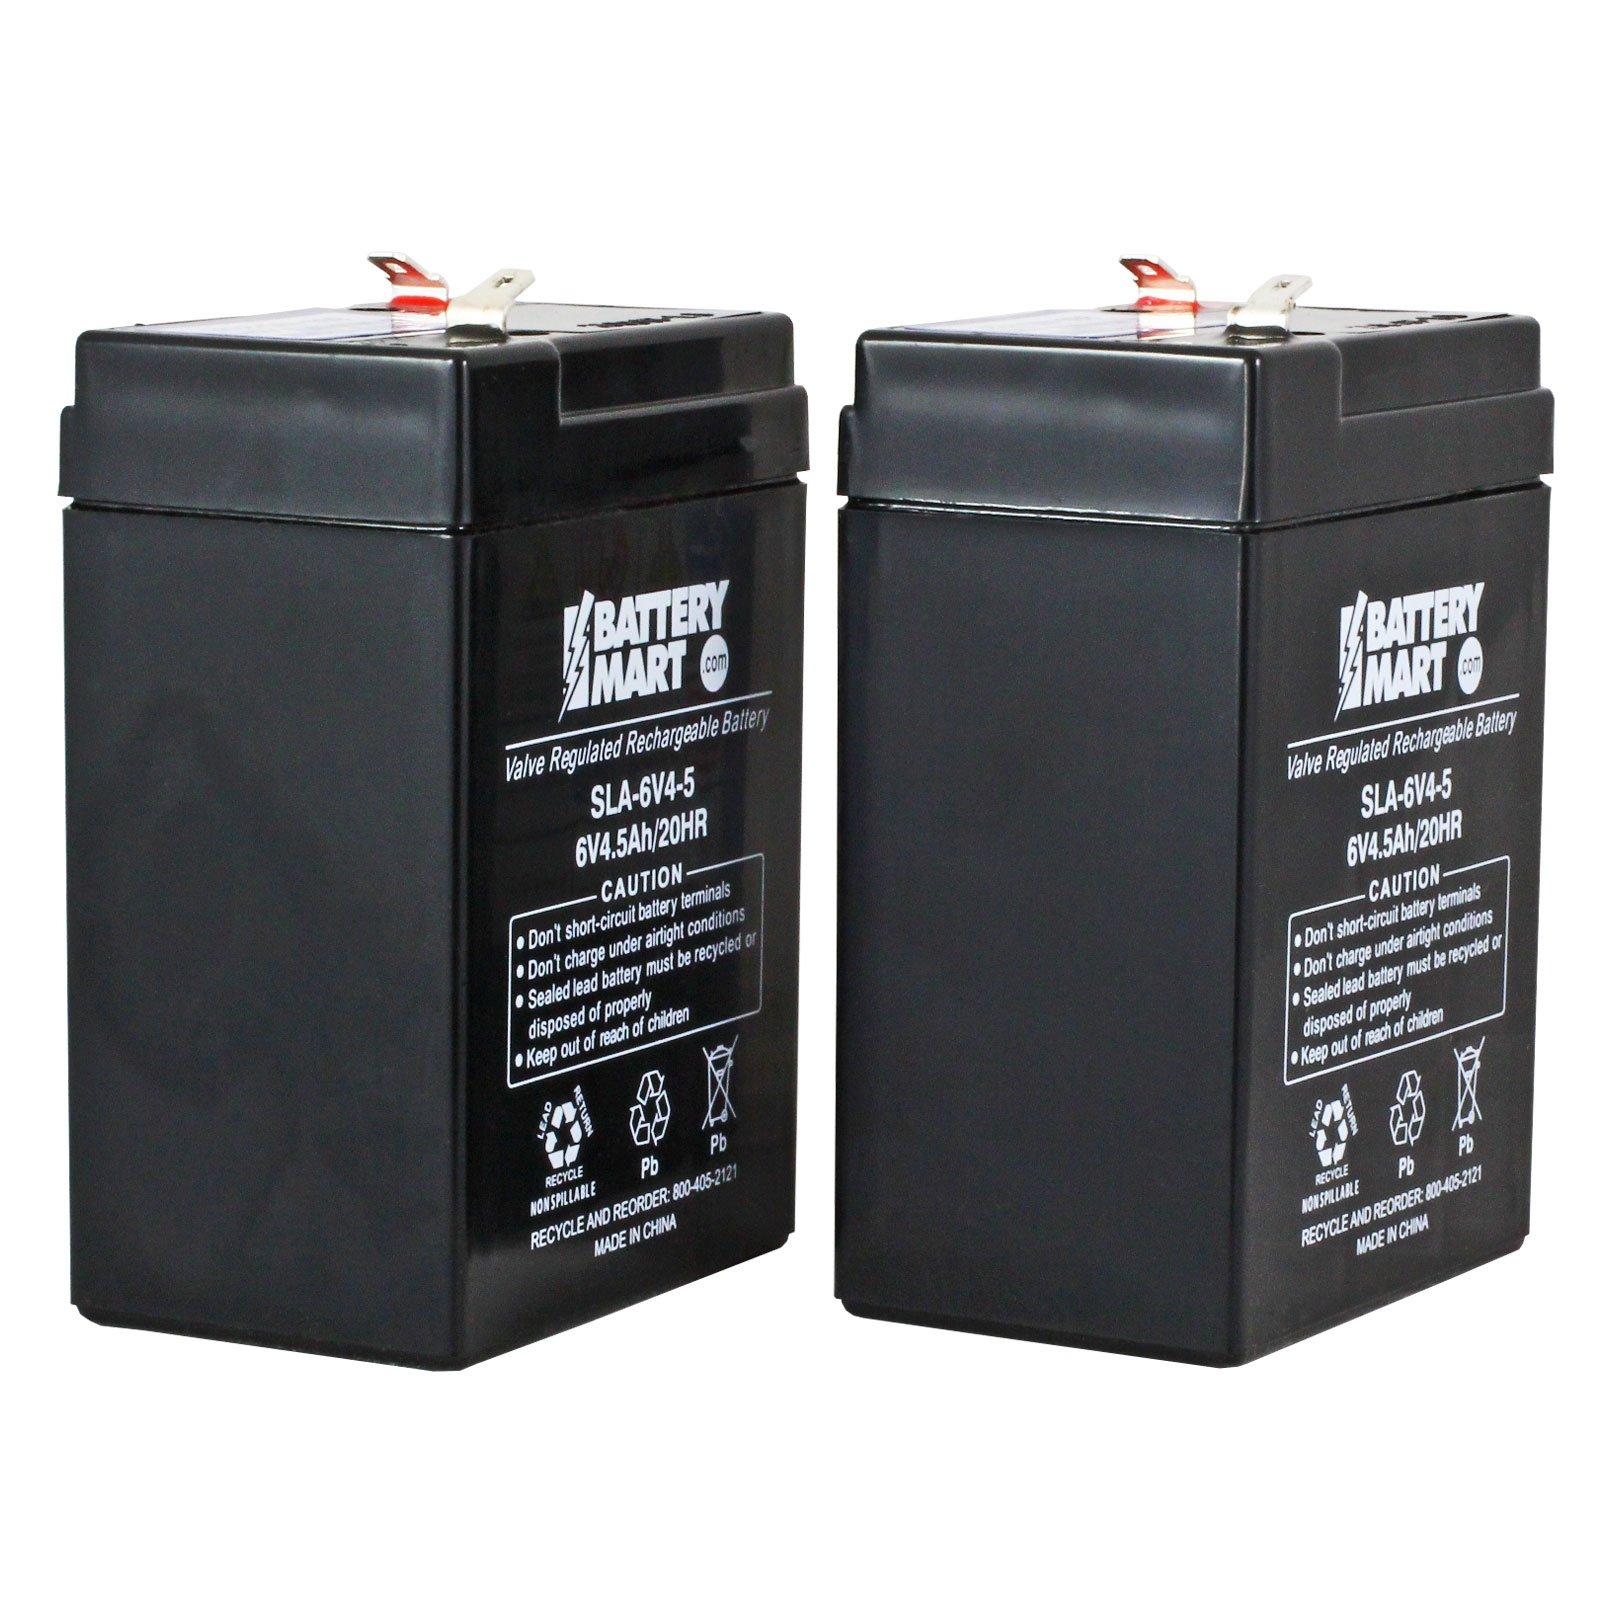 6 Volt Rechargeable Battery